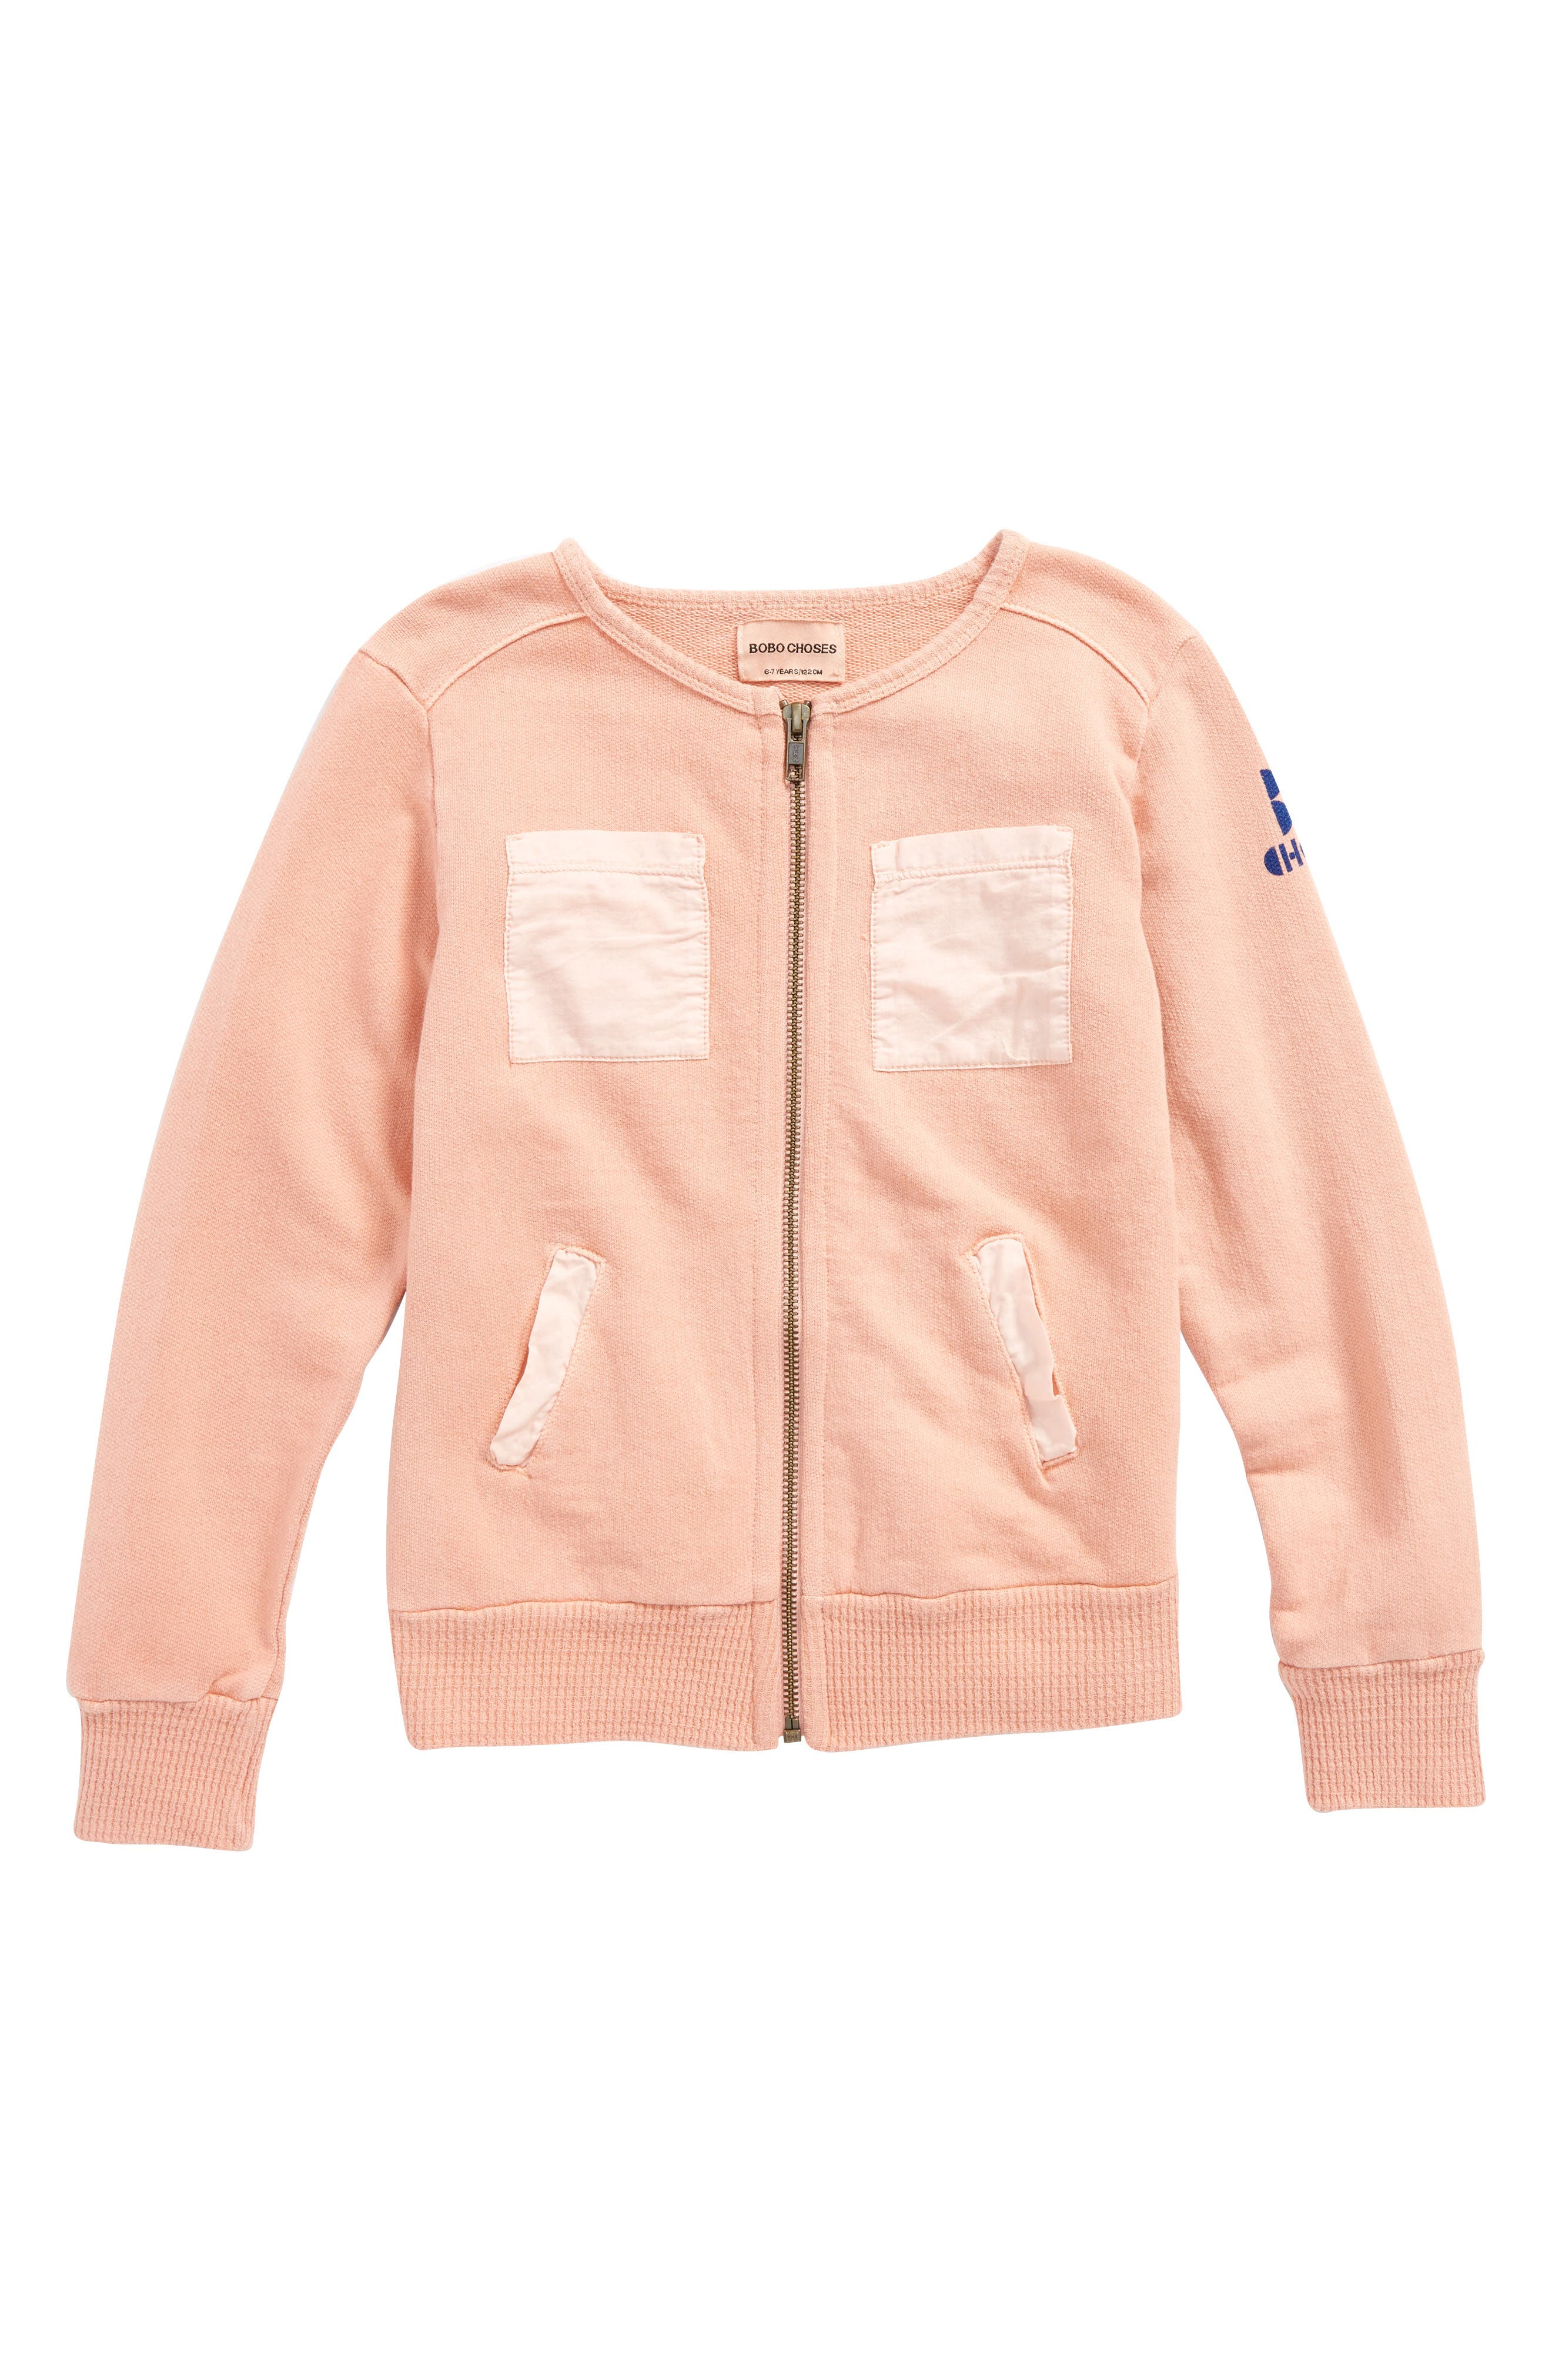 BOBO CHOSES,                             Organic Cotton Zip Jacket,                             Main thumbnail 1, color,                             653